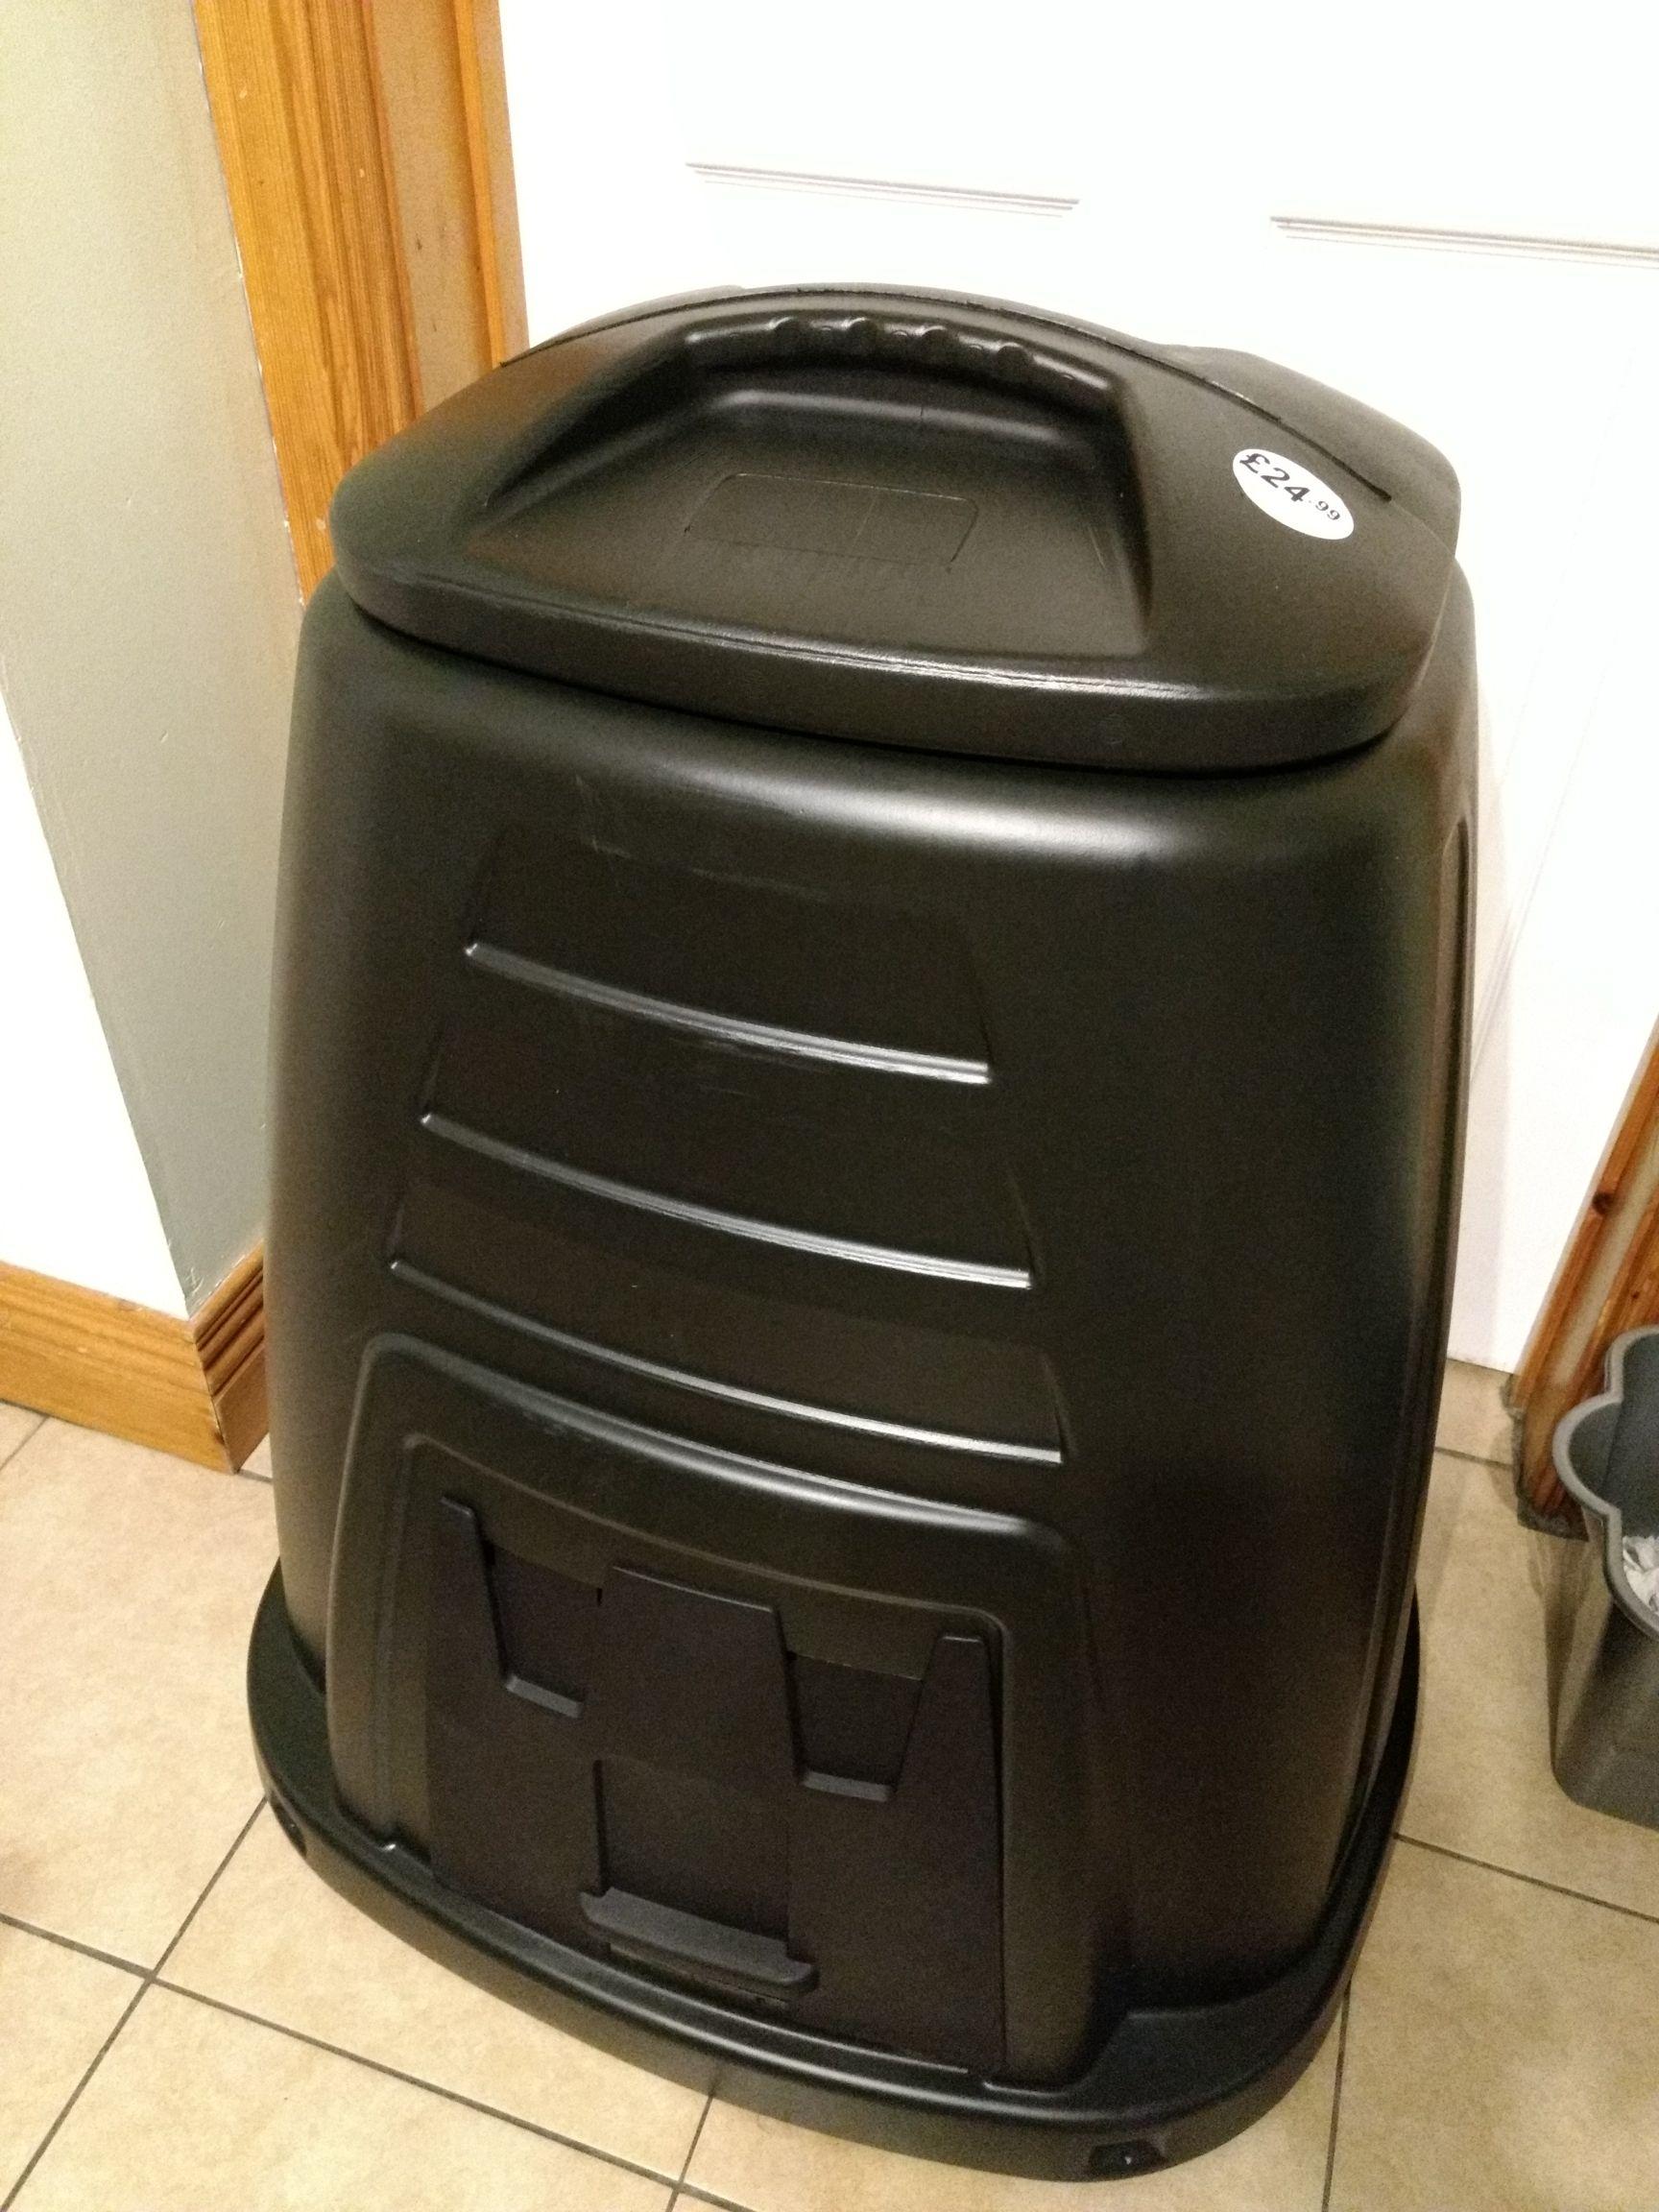 Large 220litre composter. £24.99. Poundstretcher.